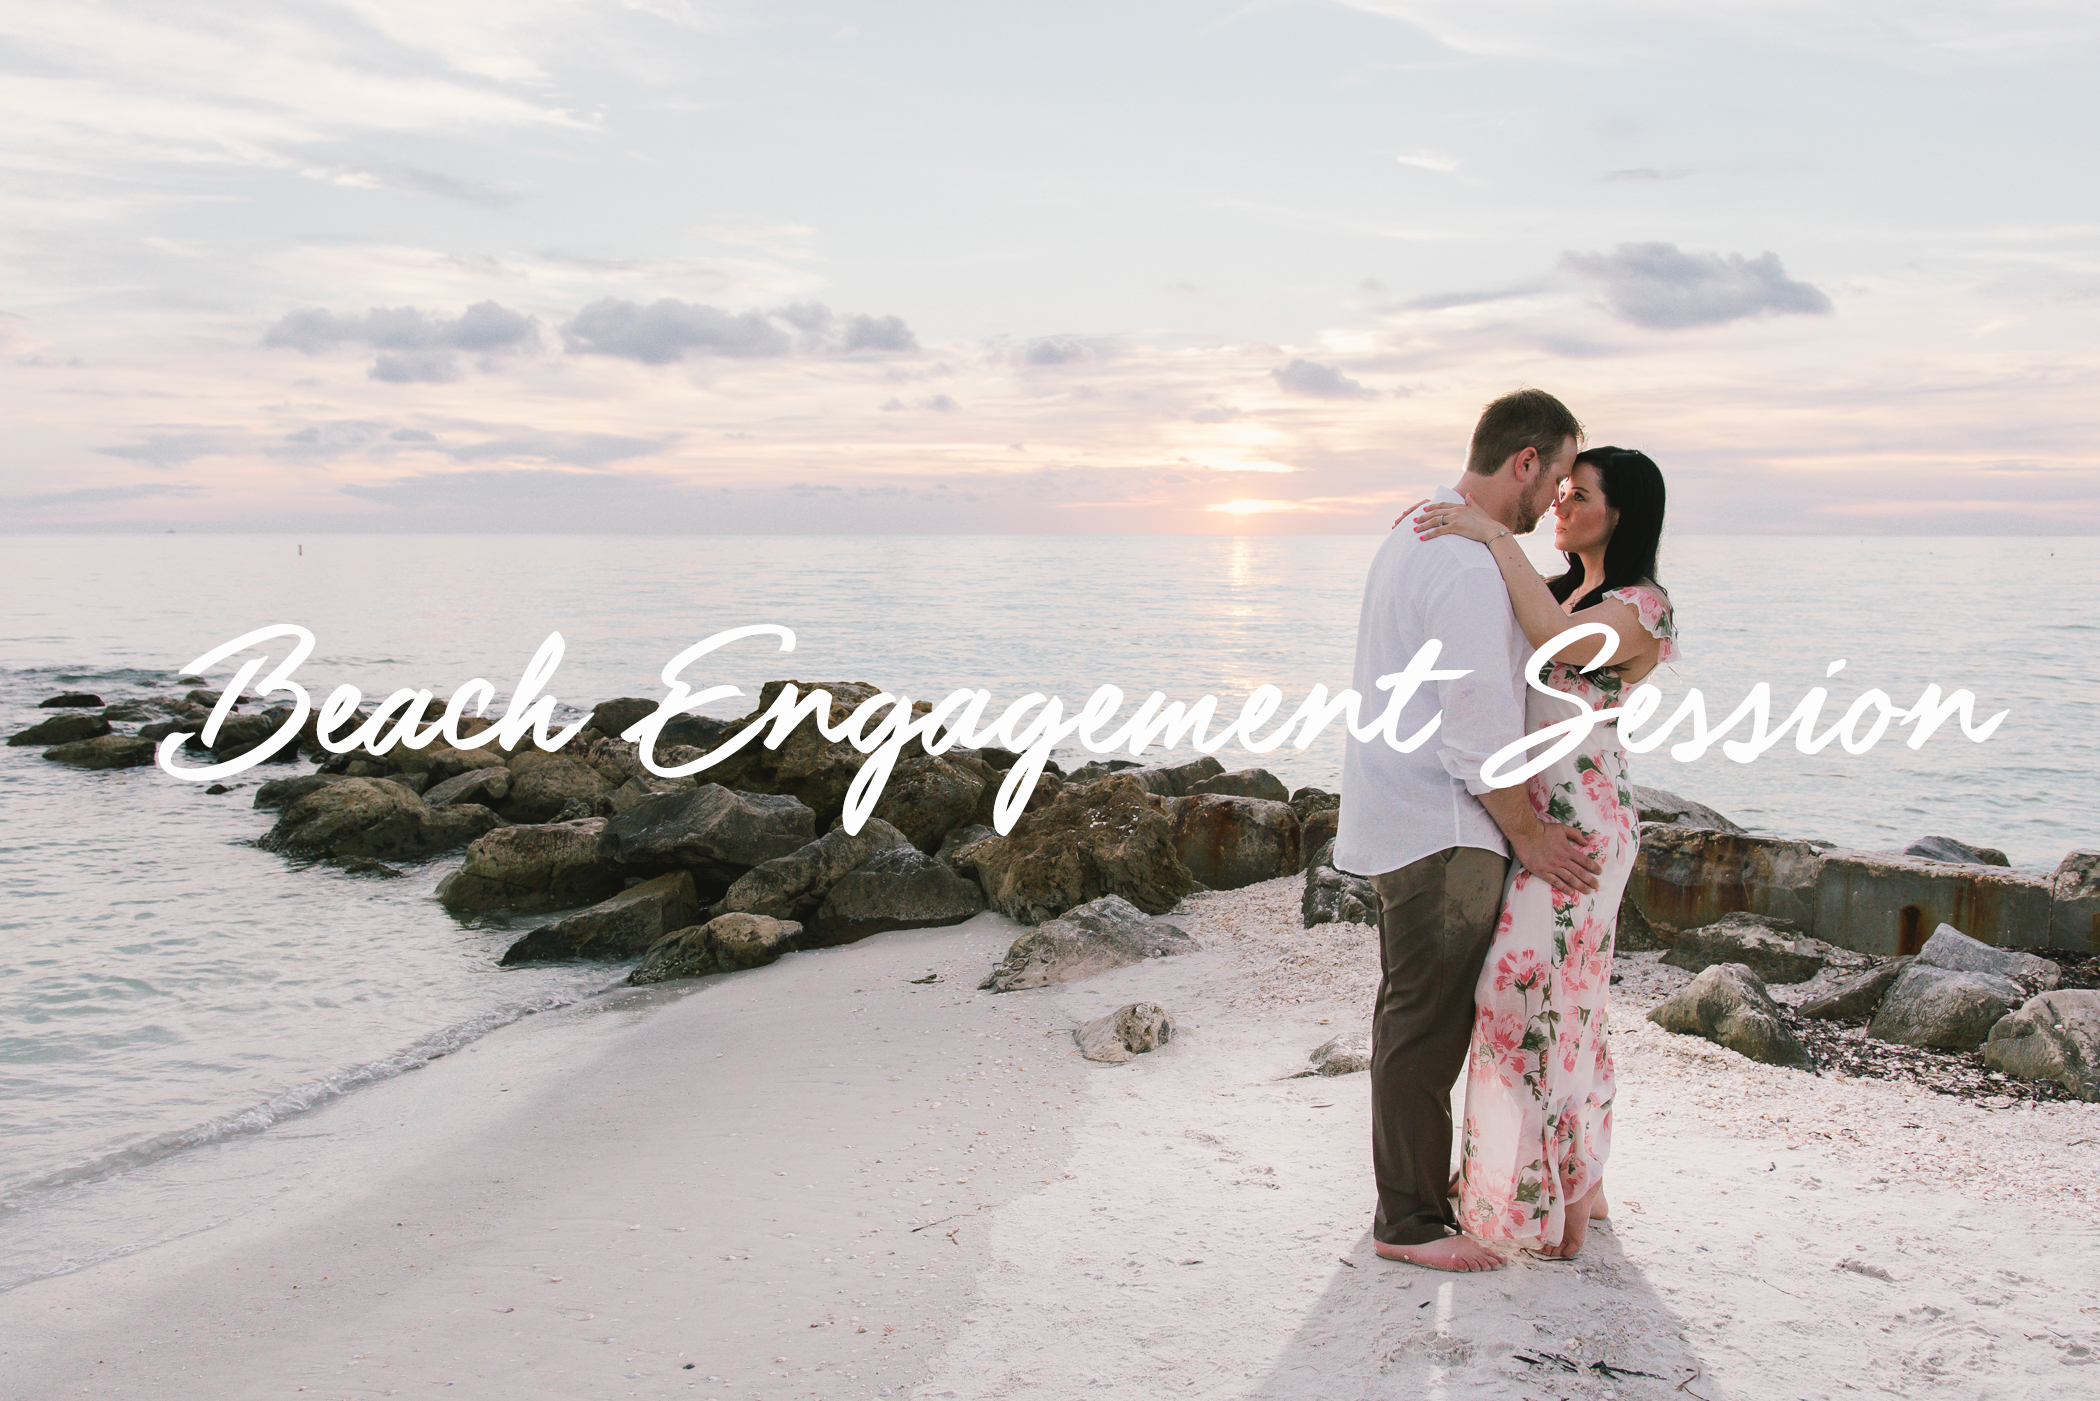 beach engagement.jpg